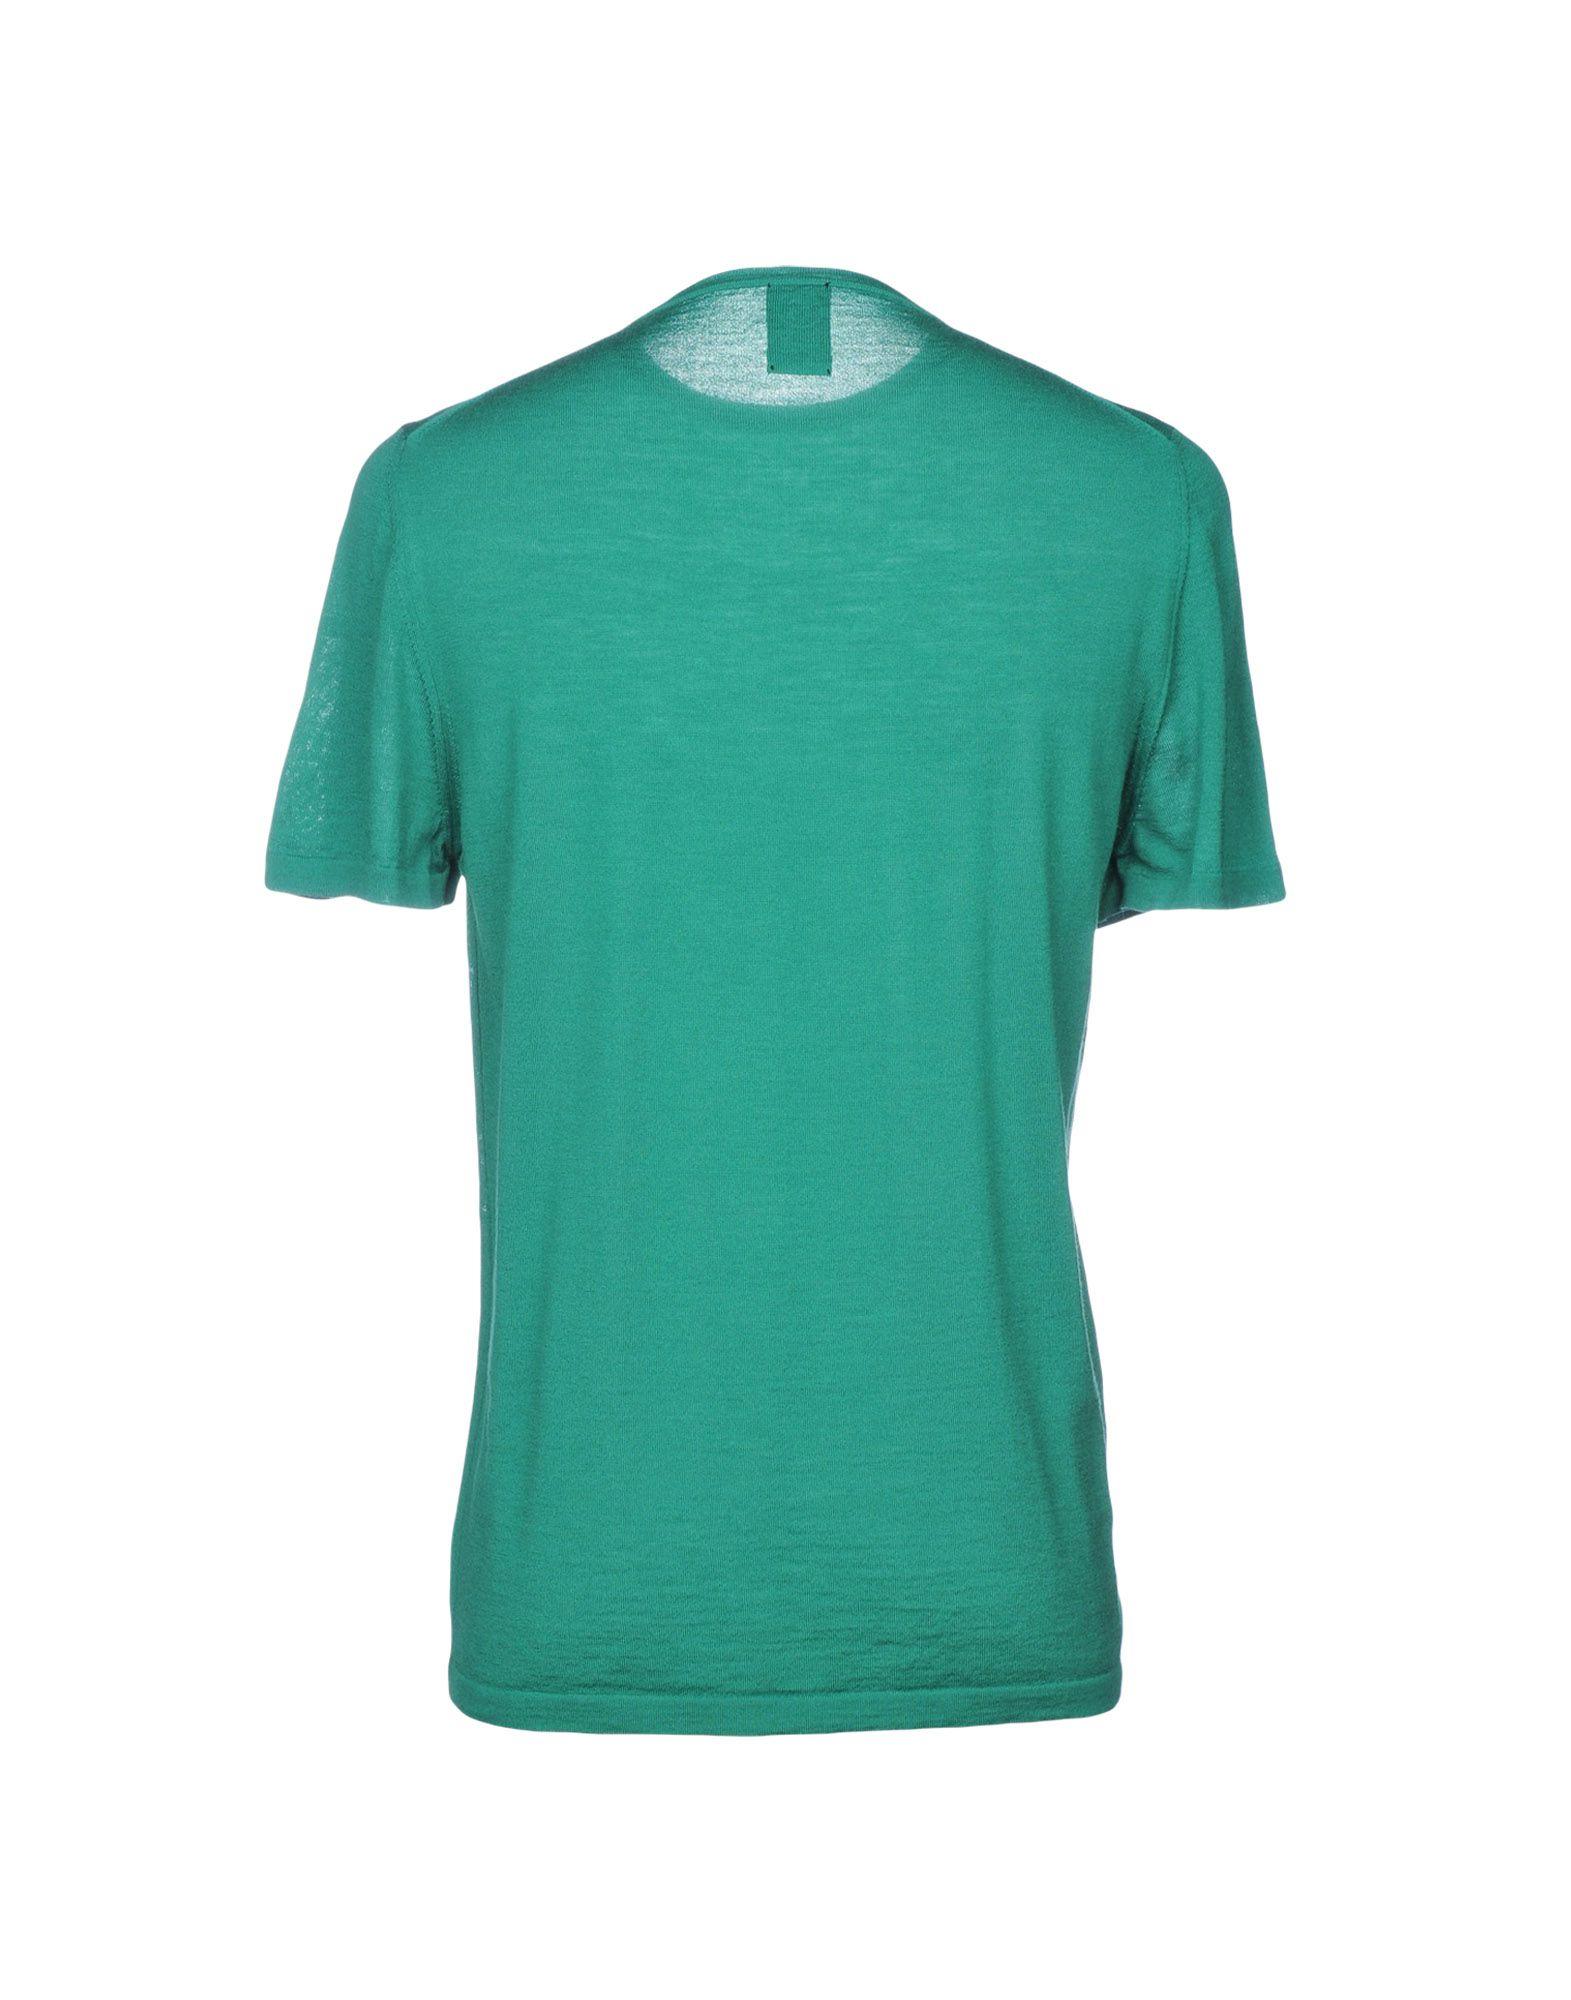 A buon mercato Pullover Soho Uomo - - Uomo 39879883OT a0bded